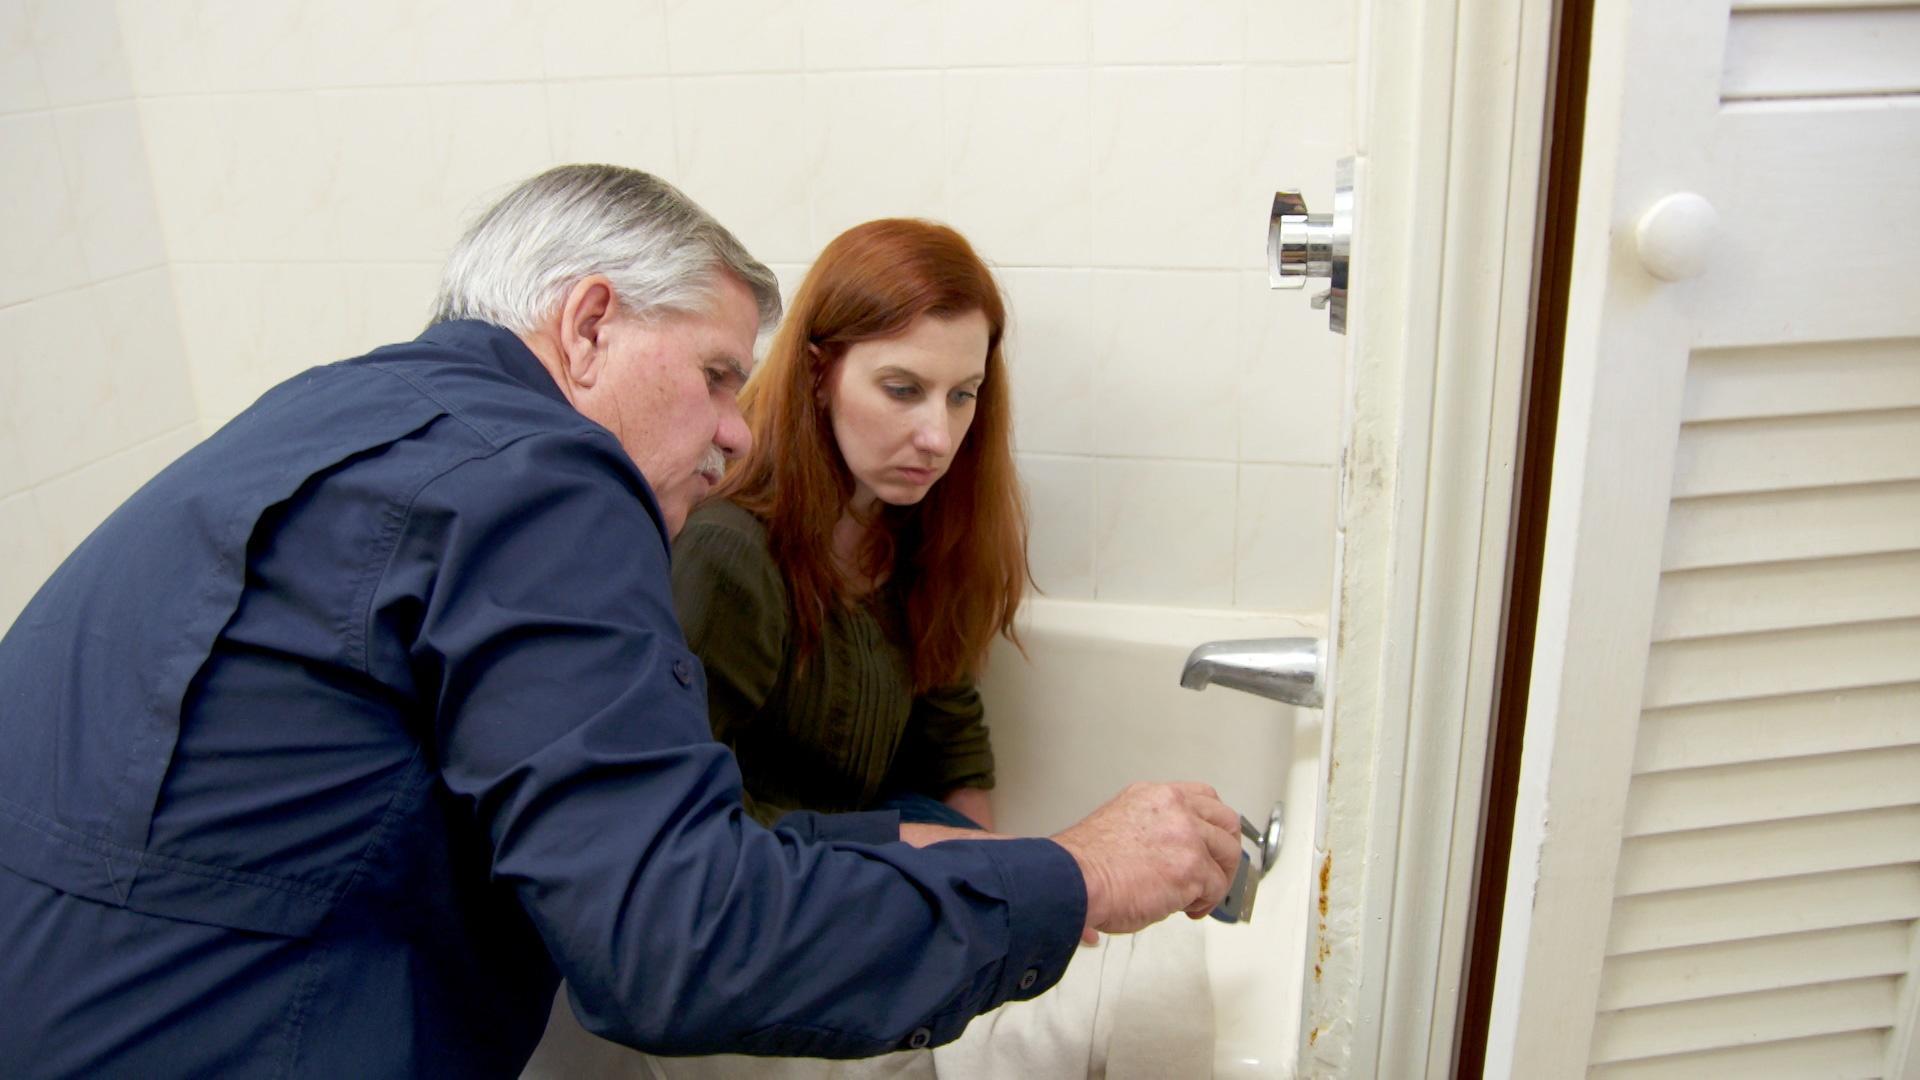 Water Filter, Bathroom Caulking | Ask TOH